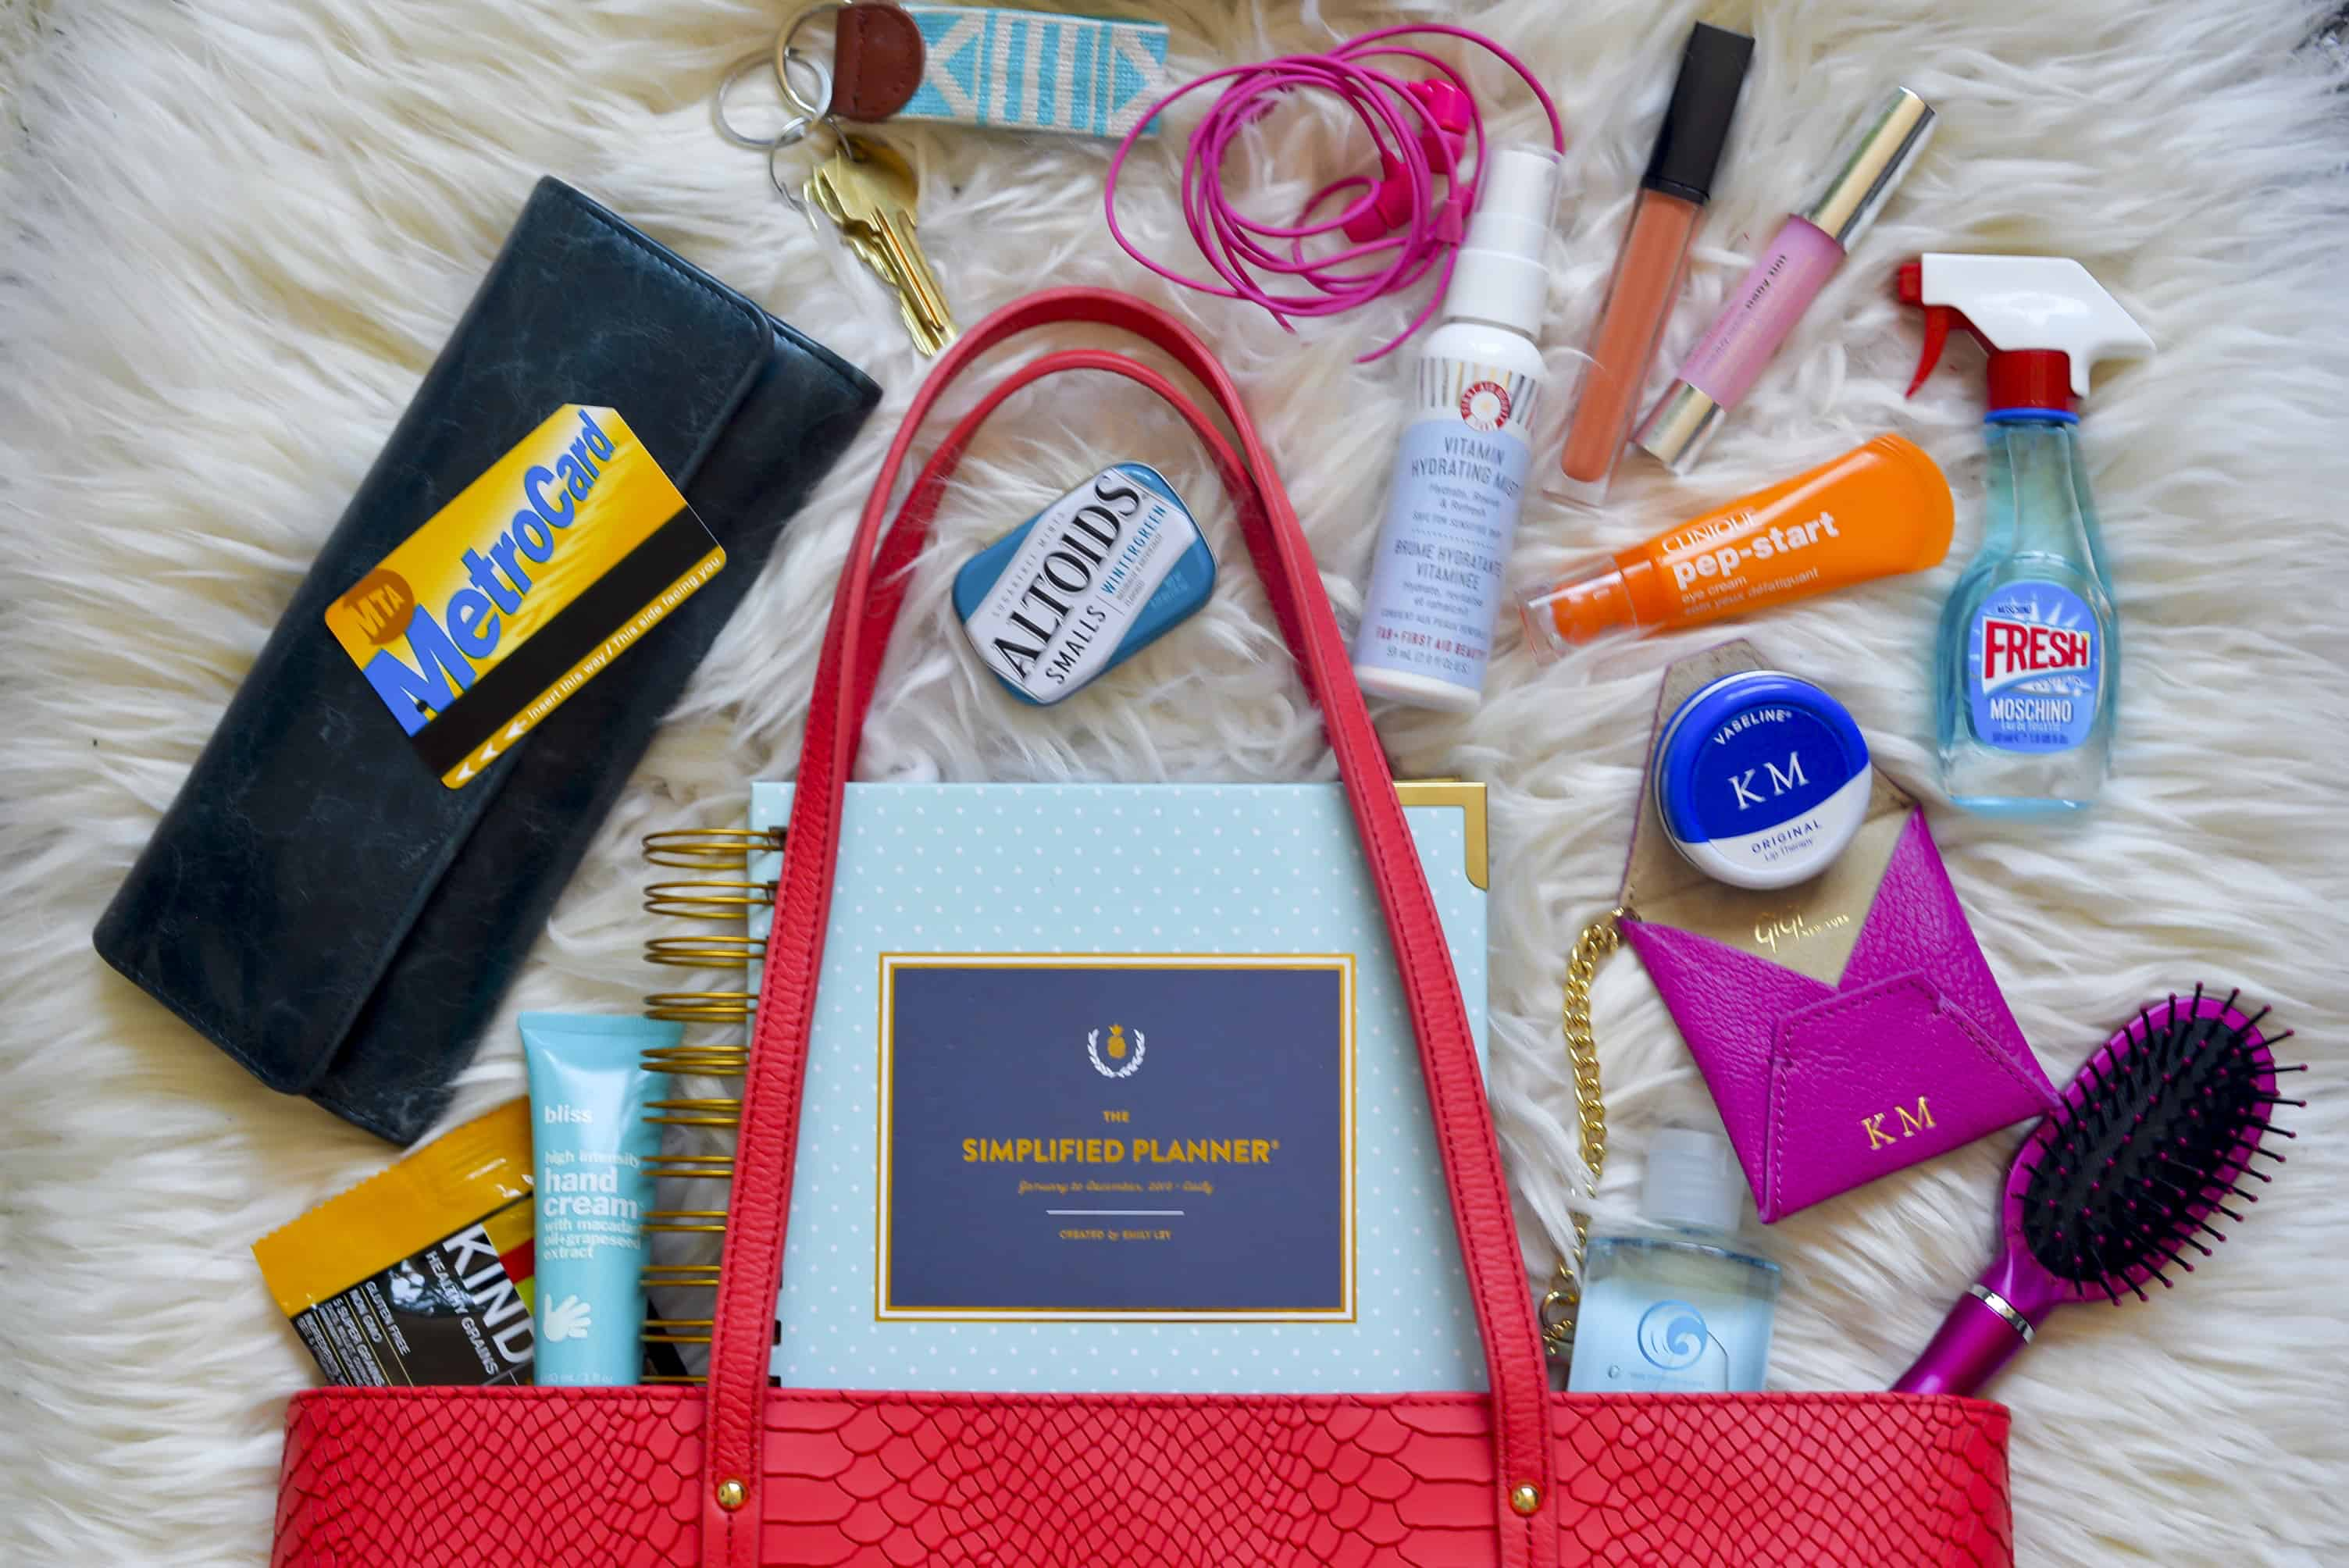 Personalized Vaseline Lip Therapy GiGi New York